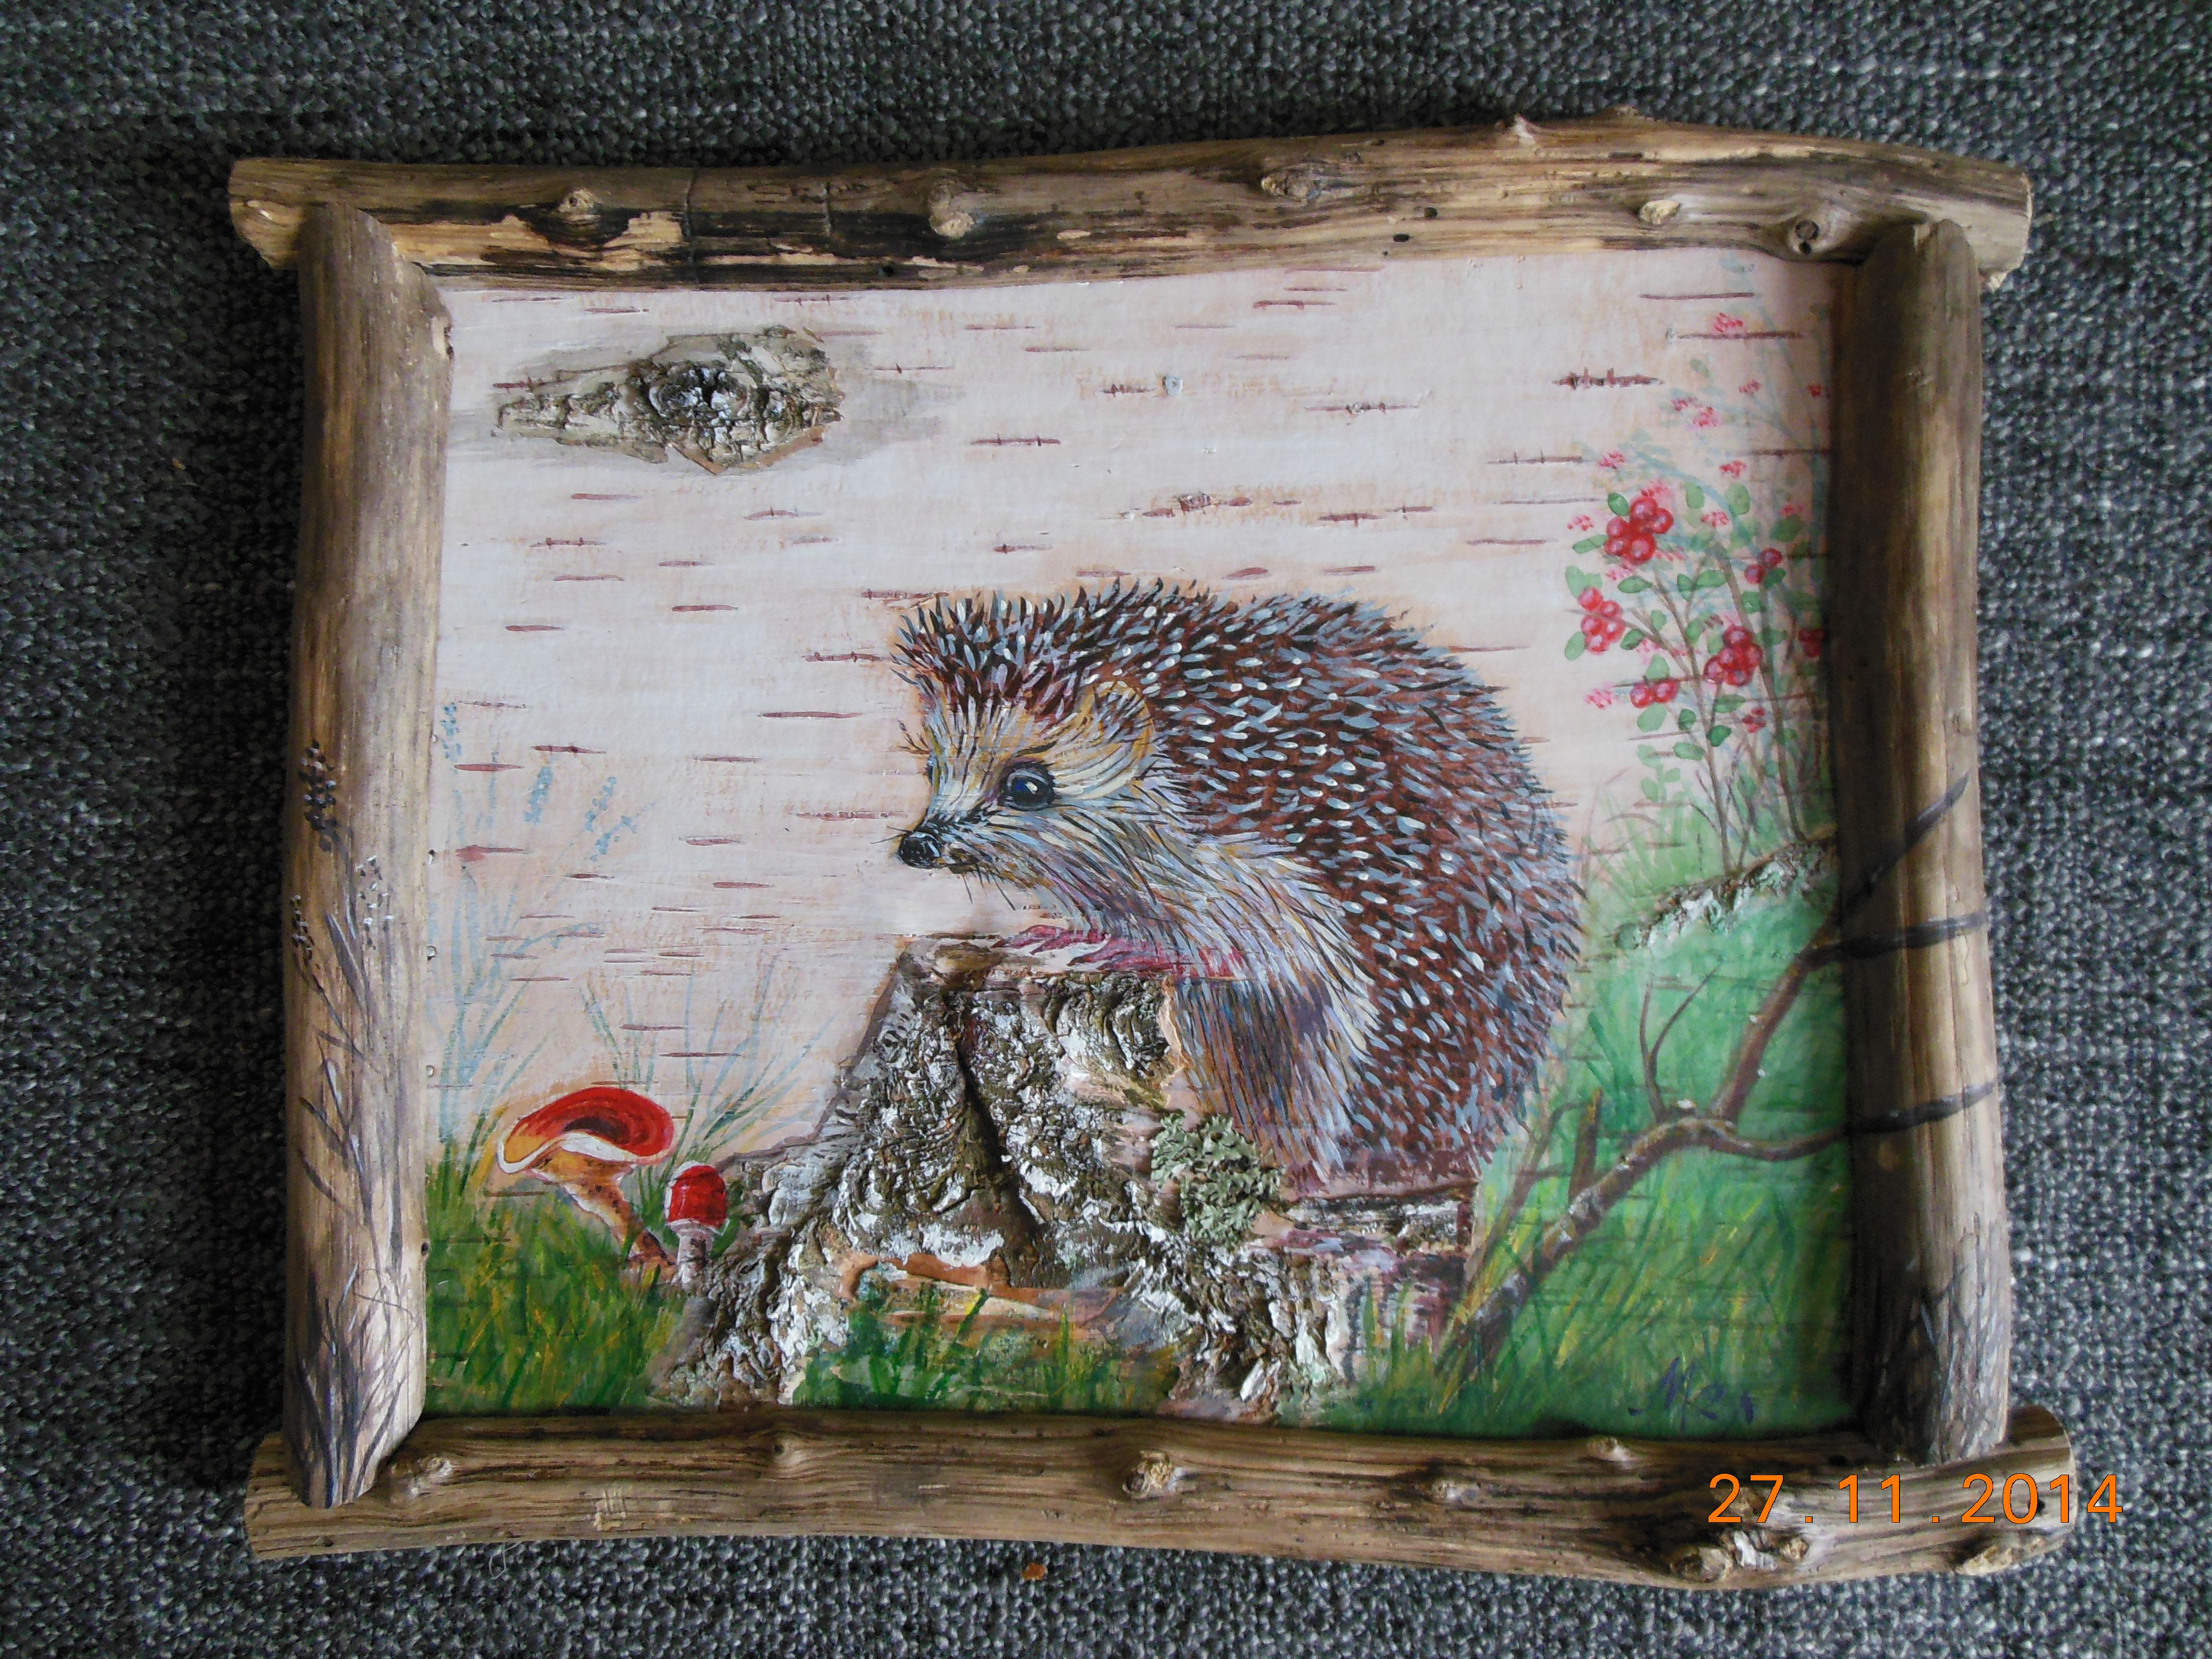 картина на бересте Ёжик и грибы | Картины, Берёста, Ежики